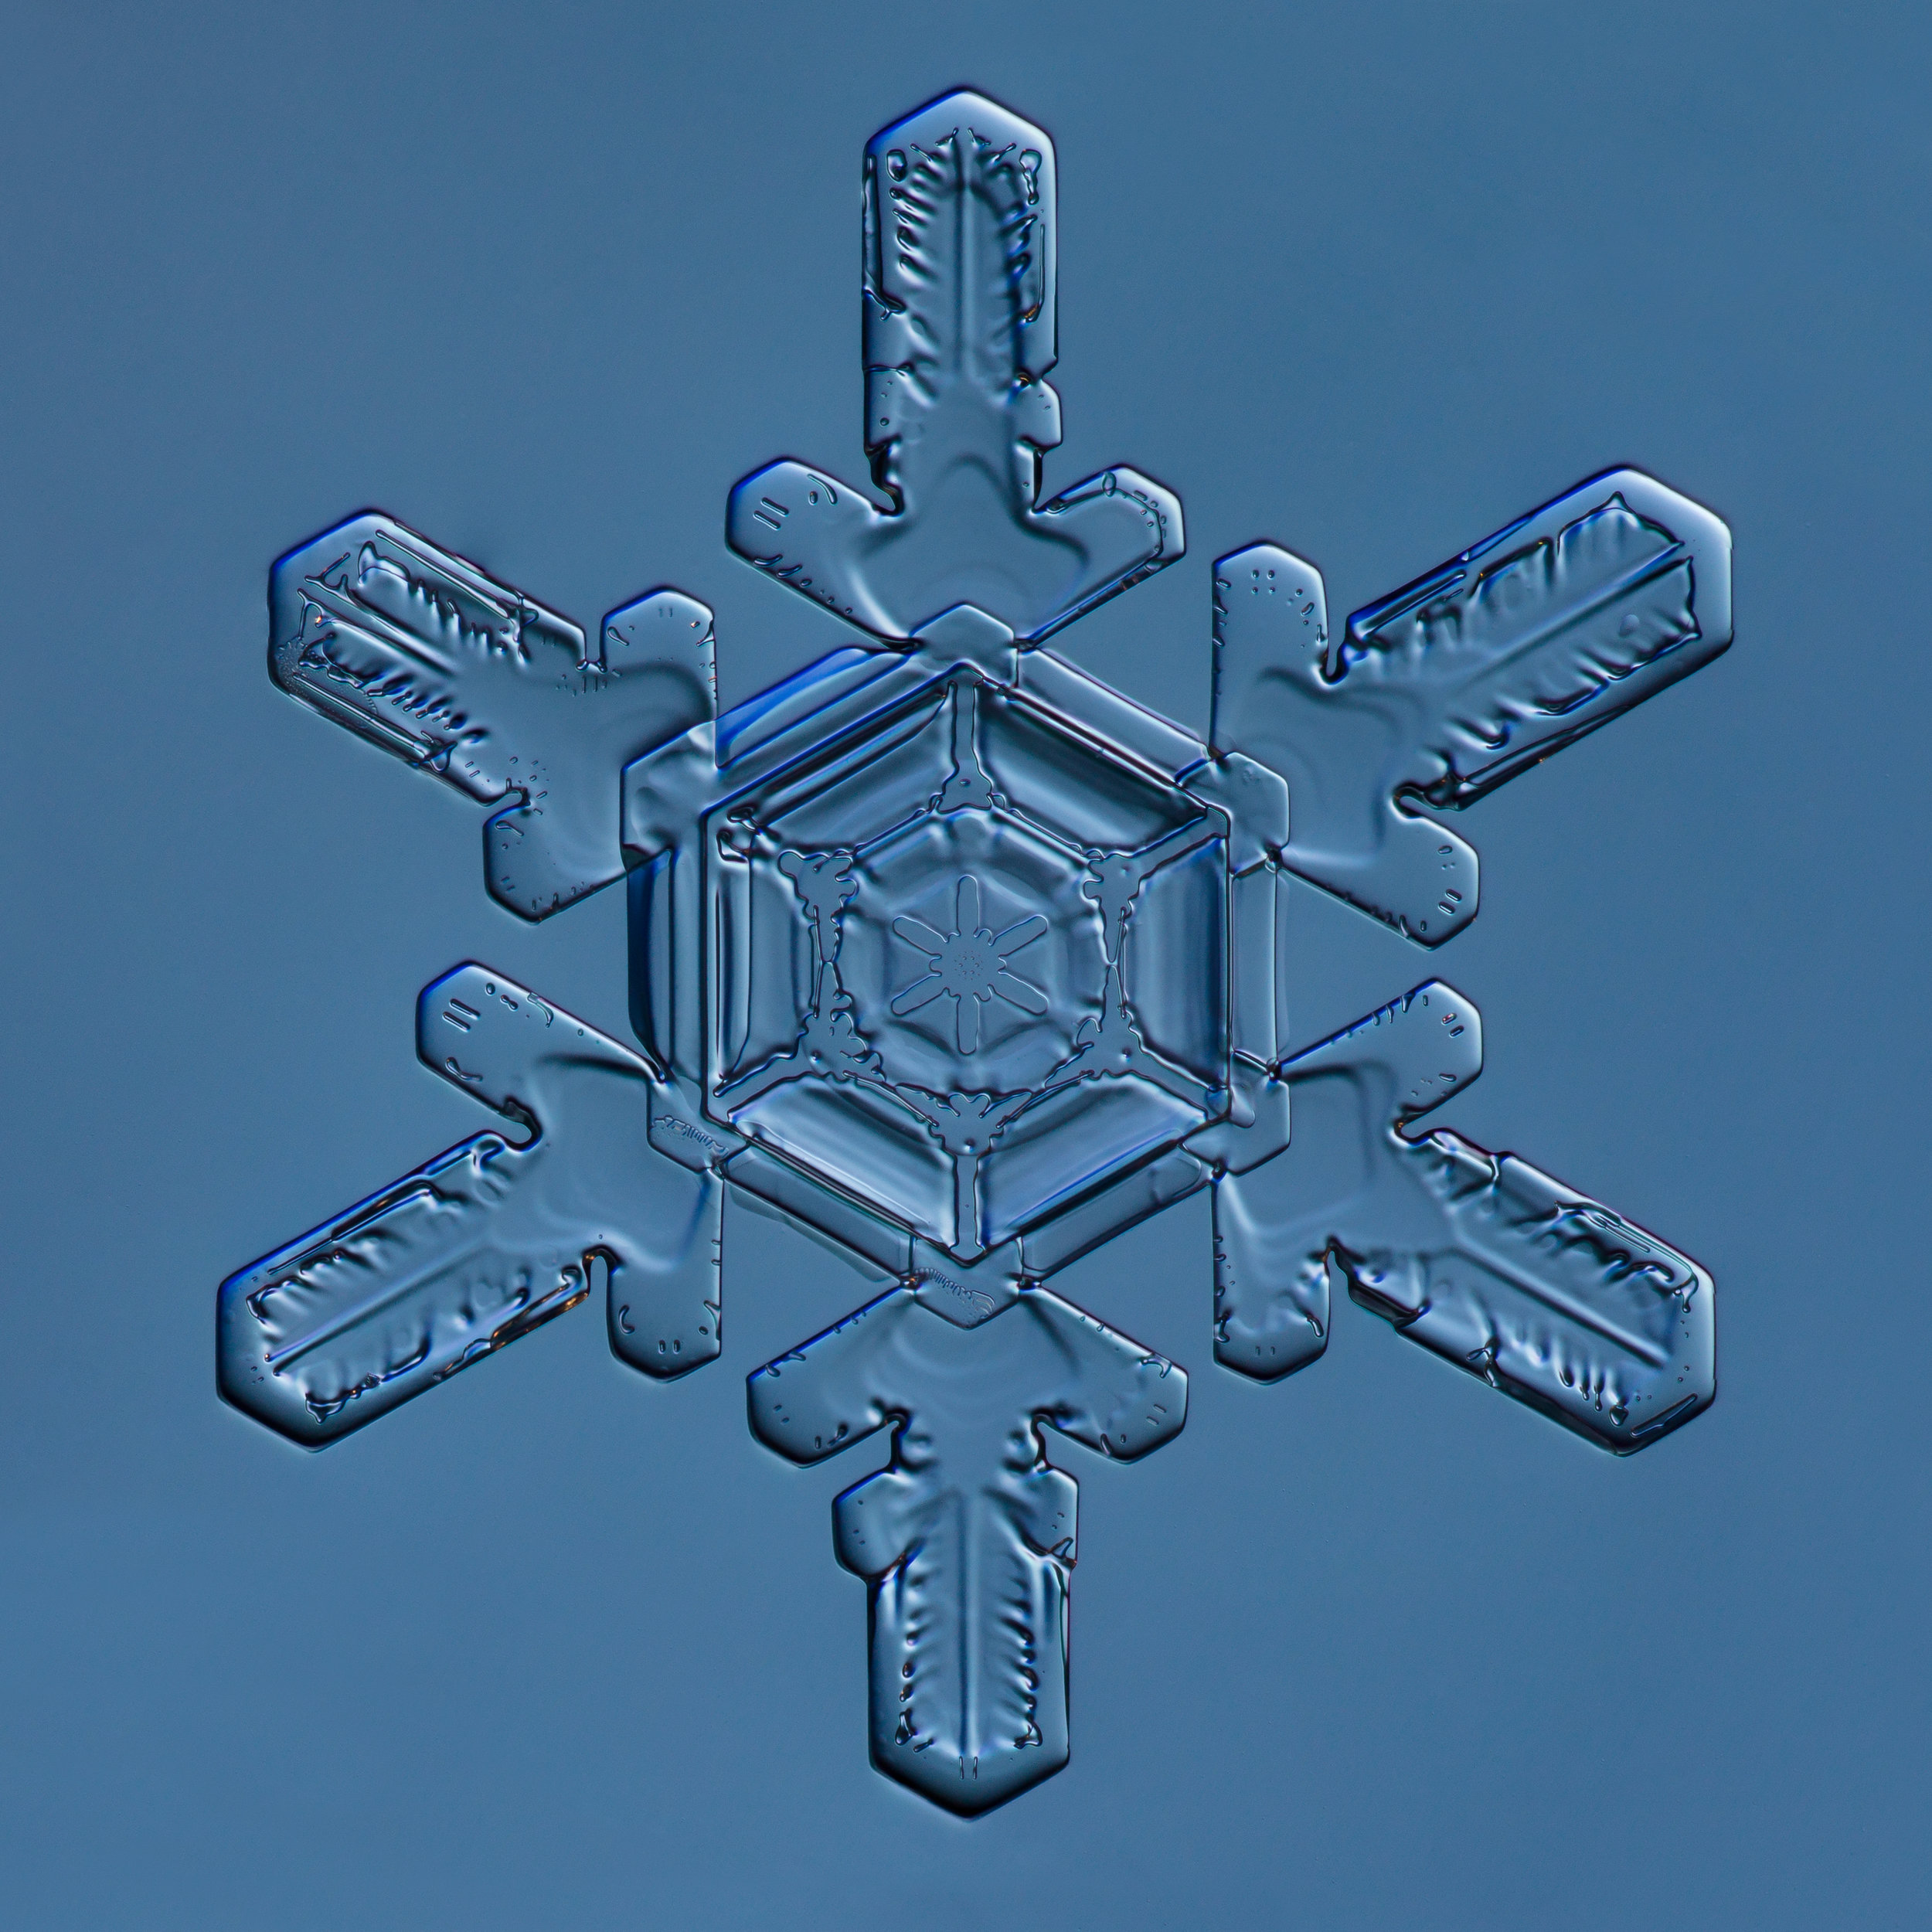 Snowflake 2014.02.22.001B.JPG